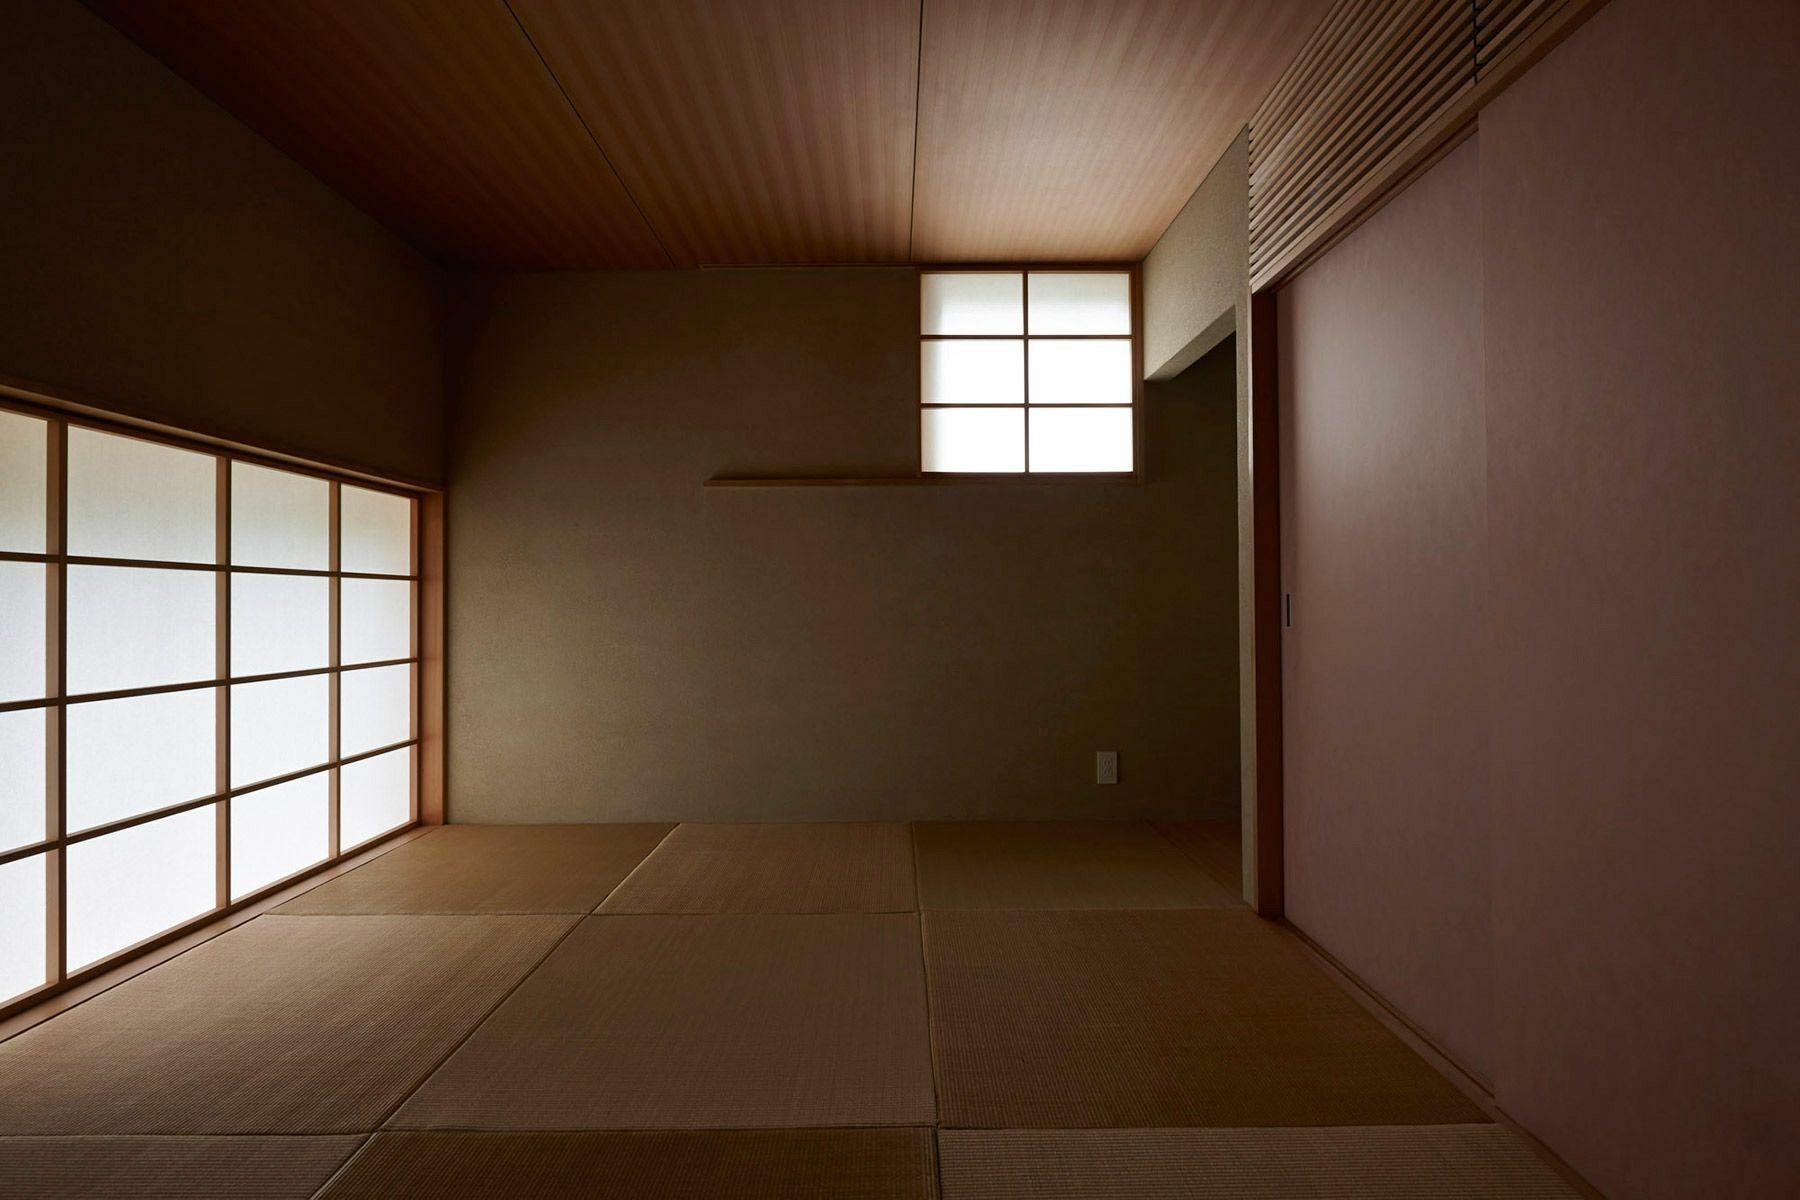 studio ogawasanchi スタジオ 小川さん家